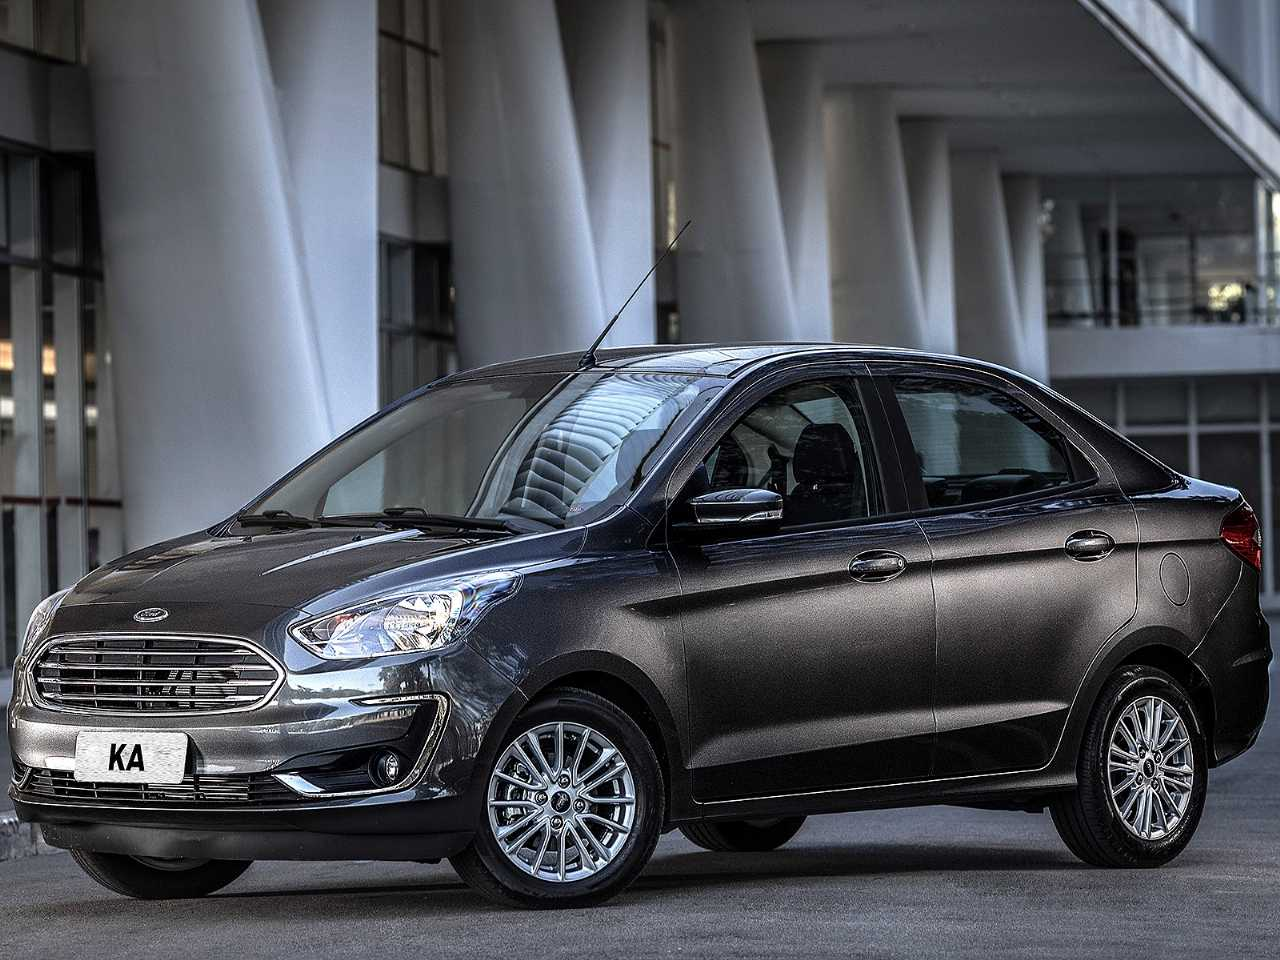 FordKa Sedan 2019 - lateral